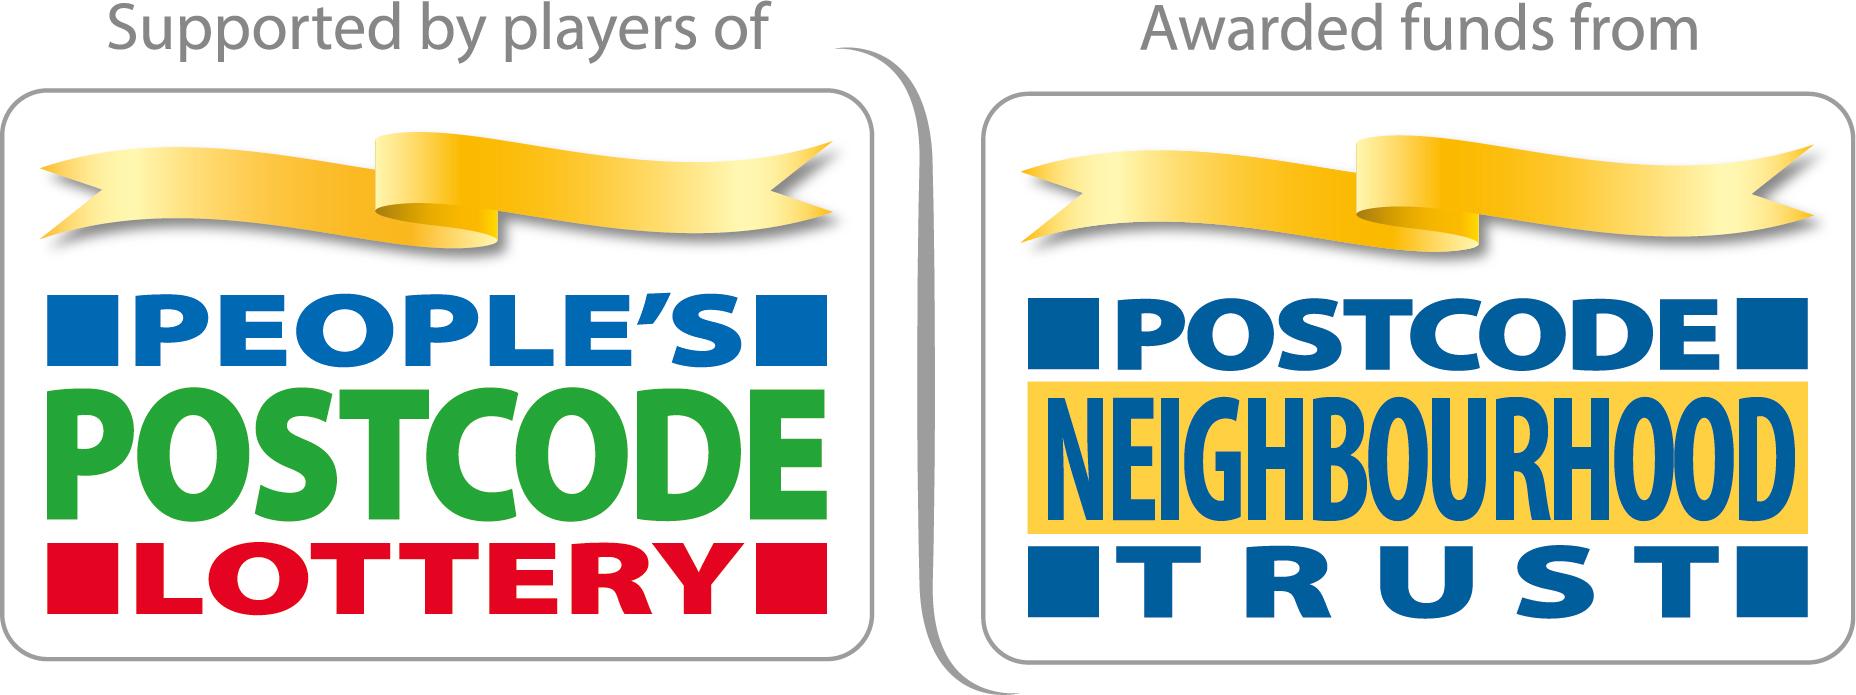 Postcode Neighbourhood Trust Logo